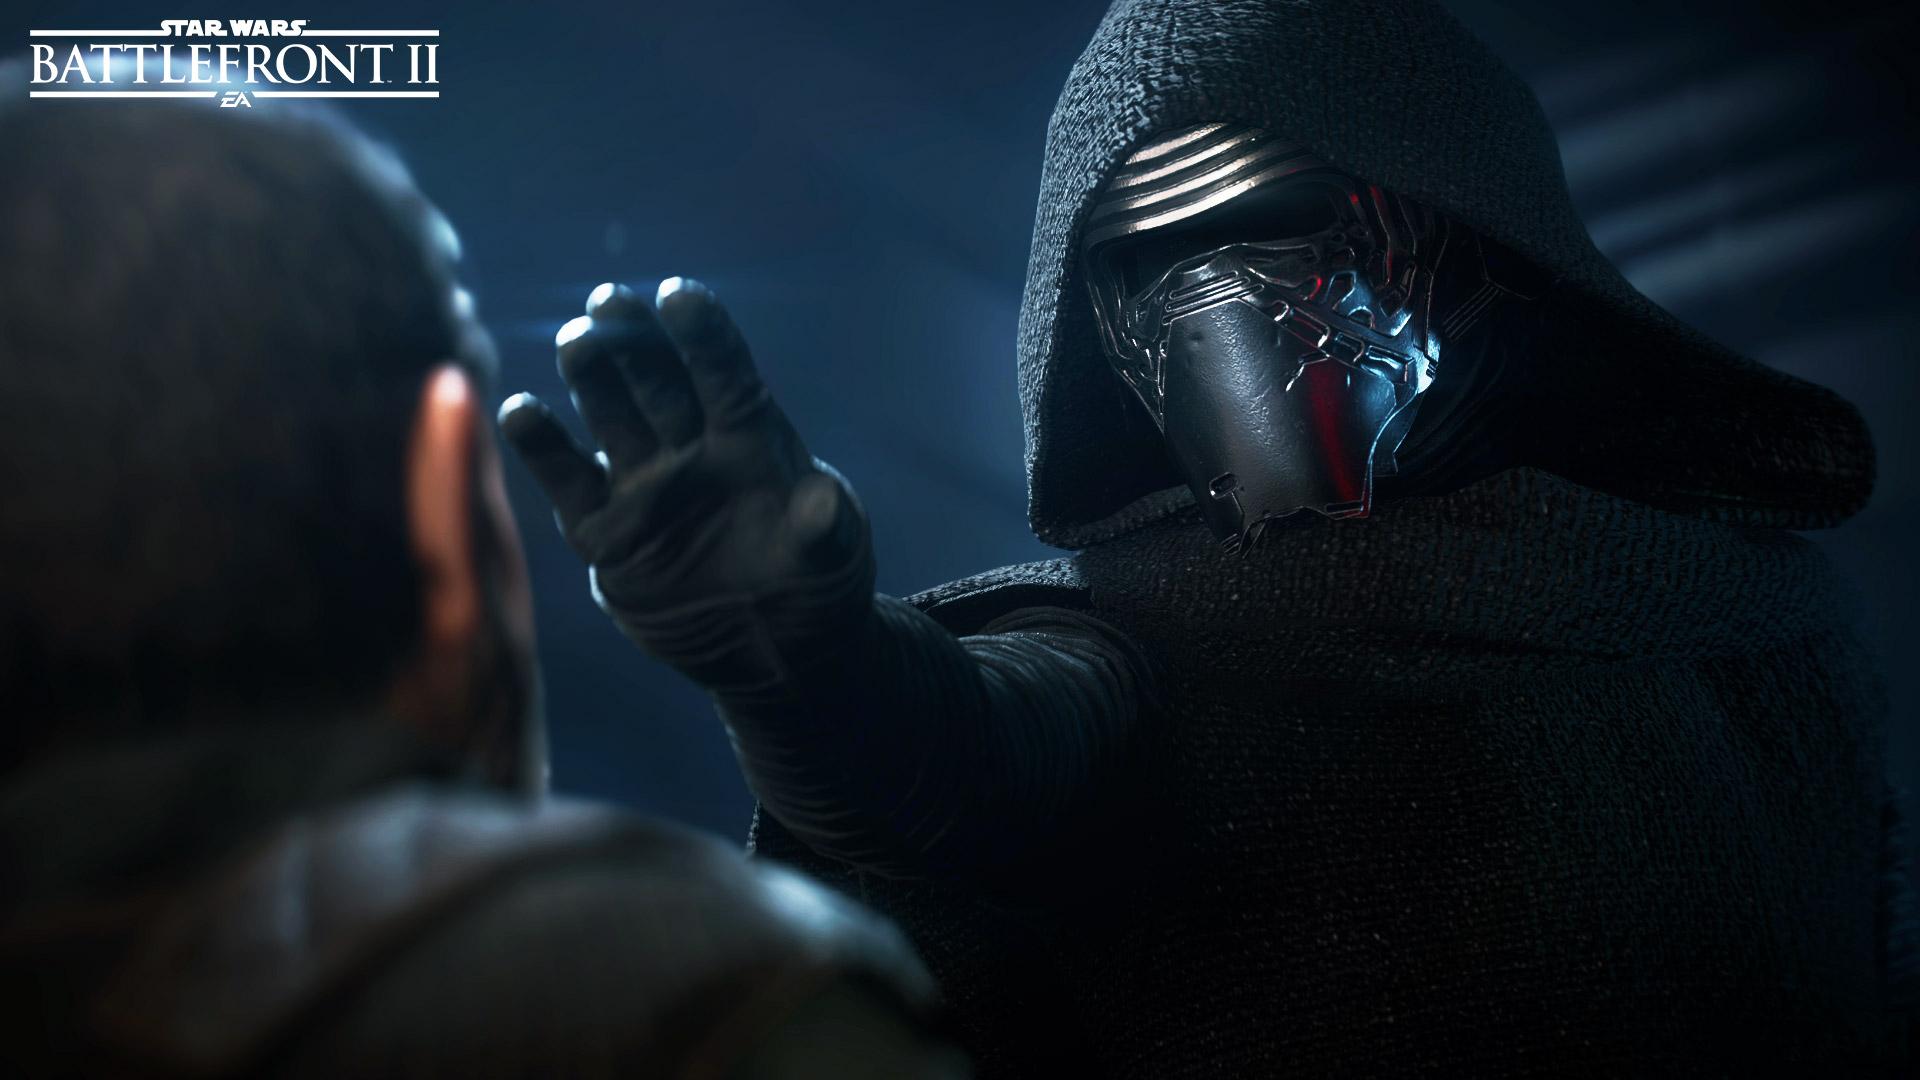 Star Wars Battlefront 2 background 11